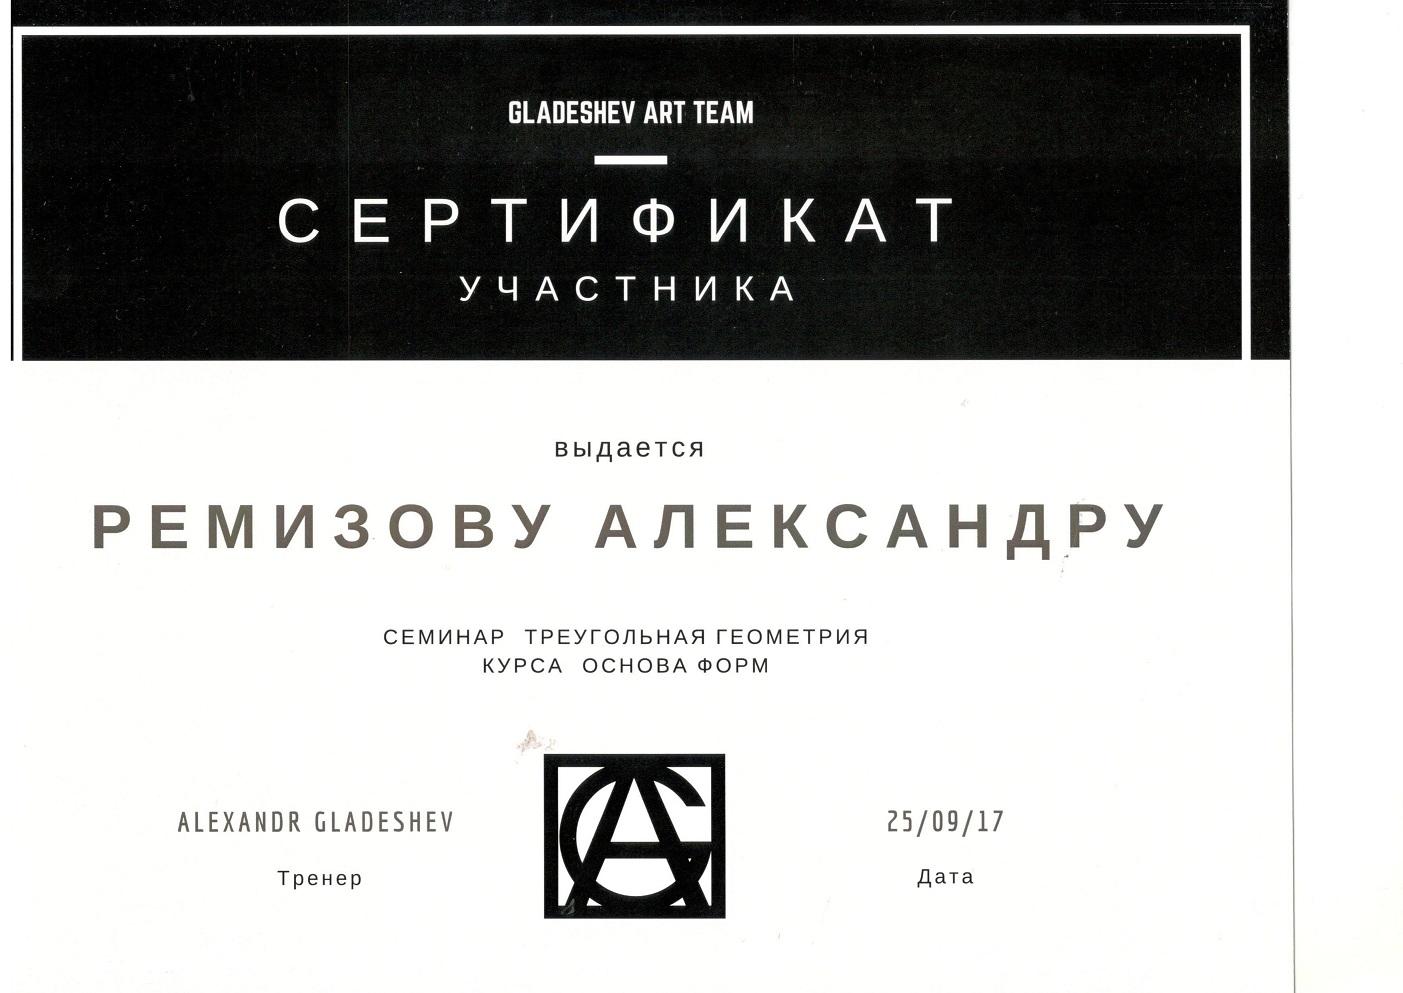 2017 gladeshev art team семинар треугольная геометрия